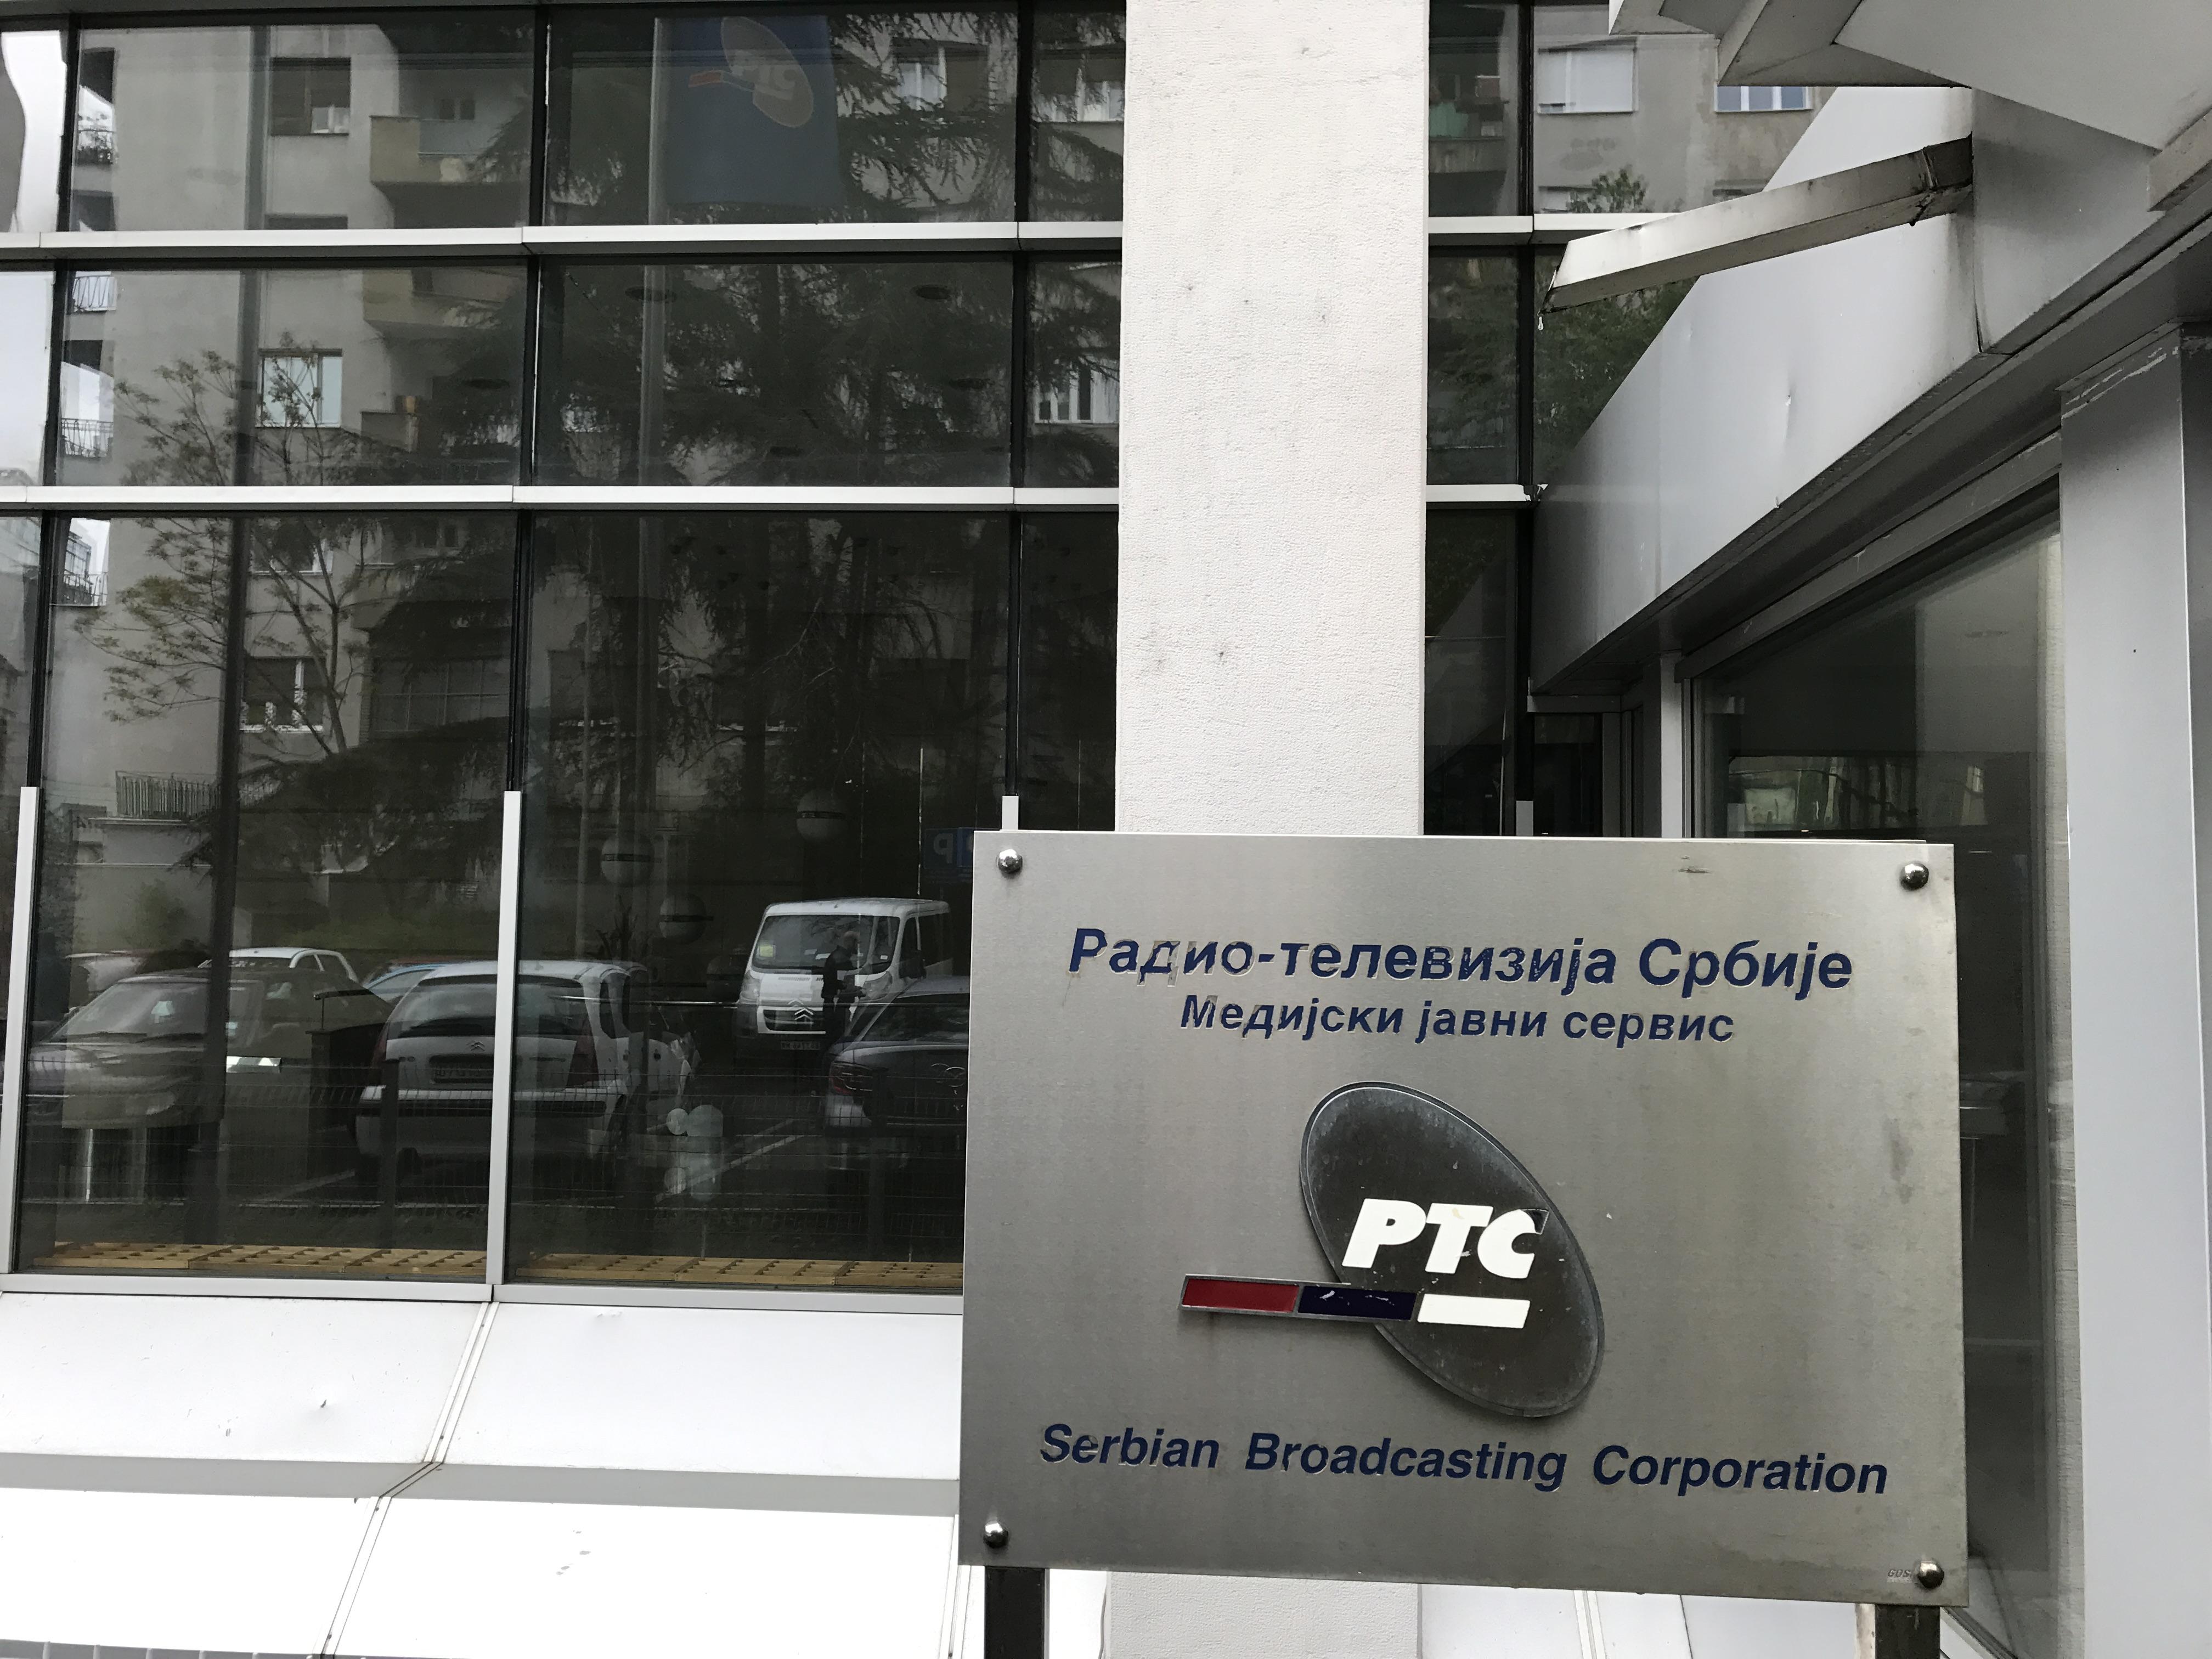 Sindikat nezadovoljan radom RTS-a; Foto: Cenzolovka/ Perica Gunjić